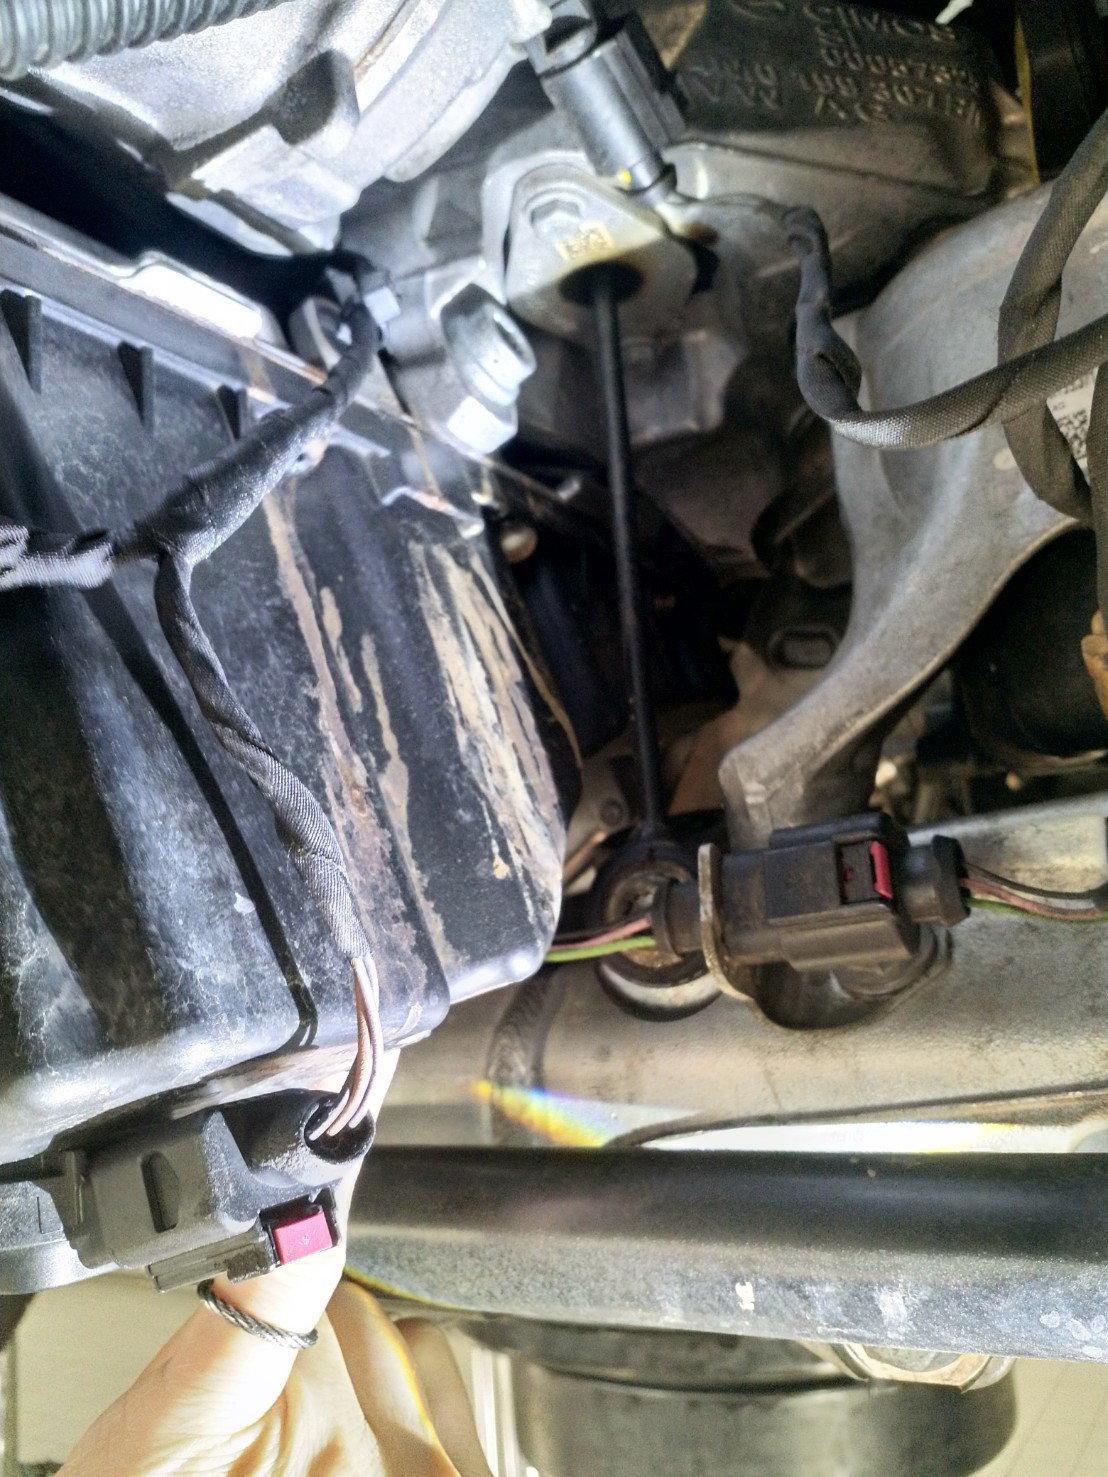 Stranded by massive coolant leak - 2 7T allroad - AudiWorld